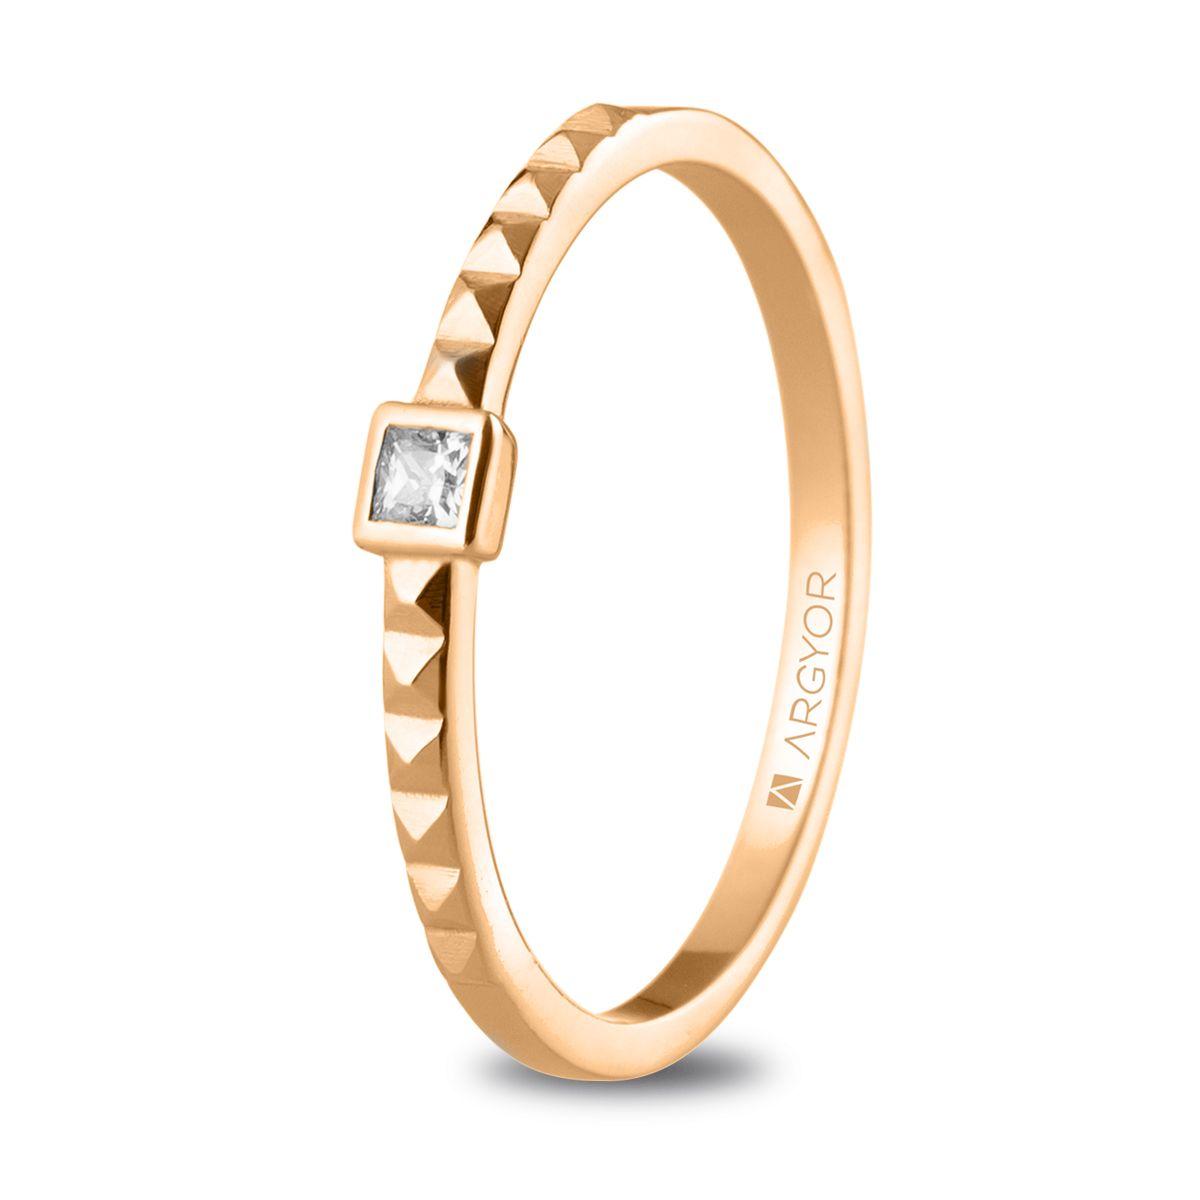 Fotos de anillos de compromiso en oro 8